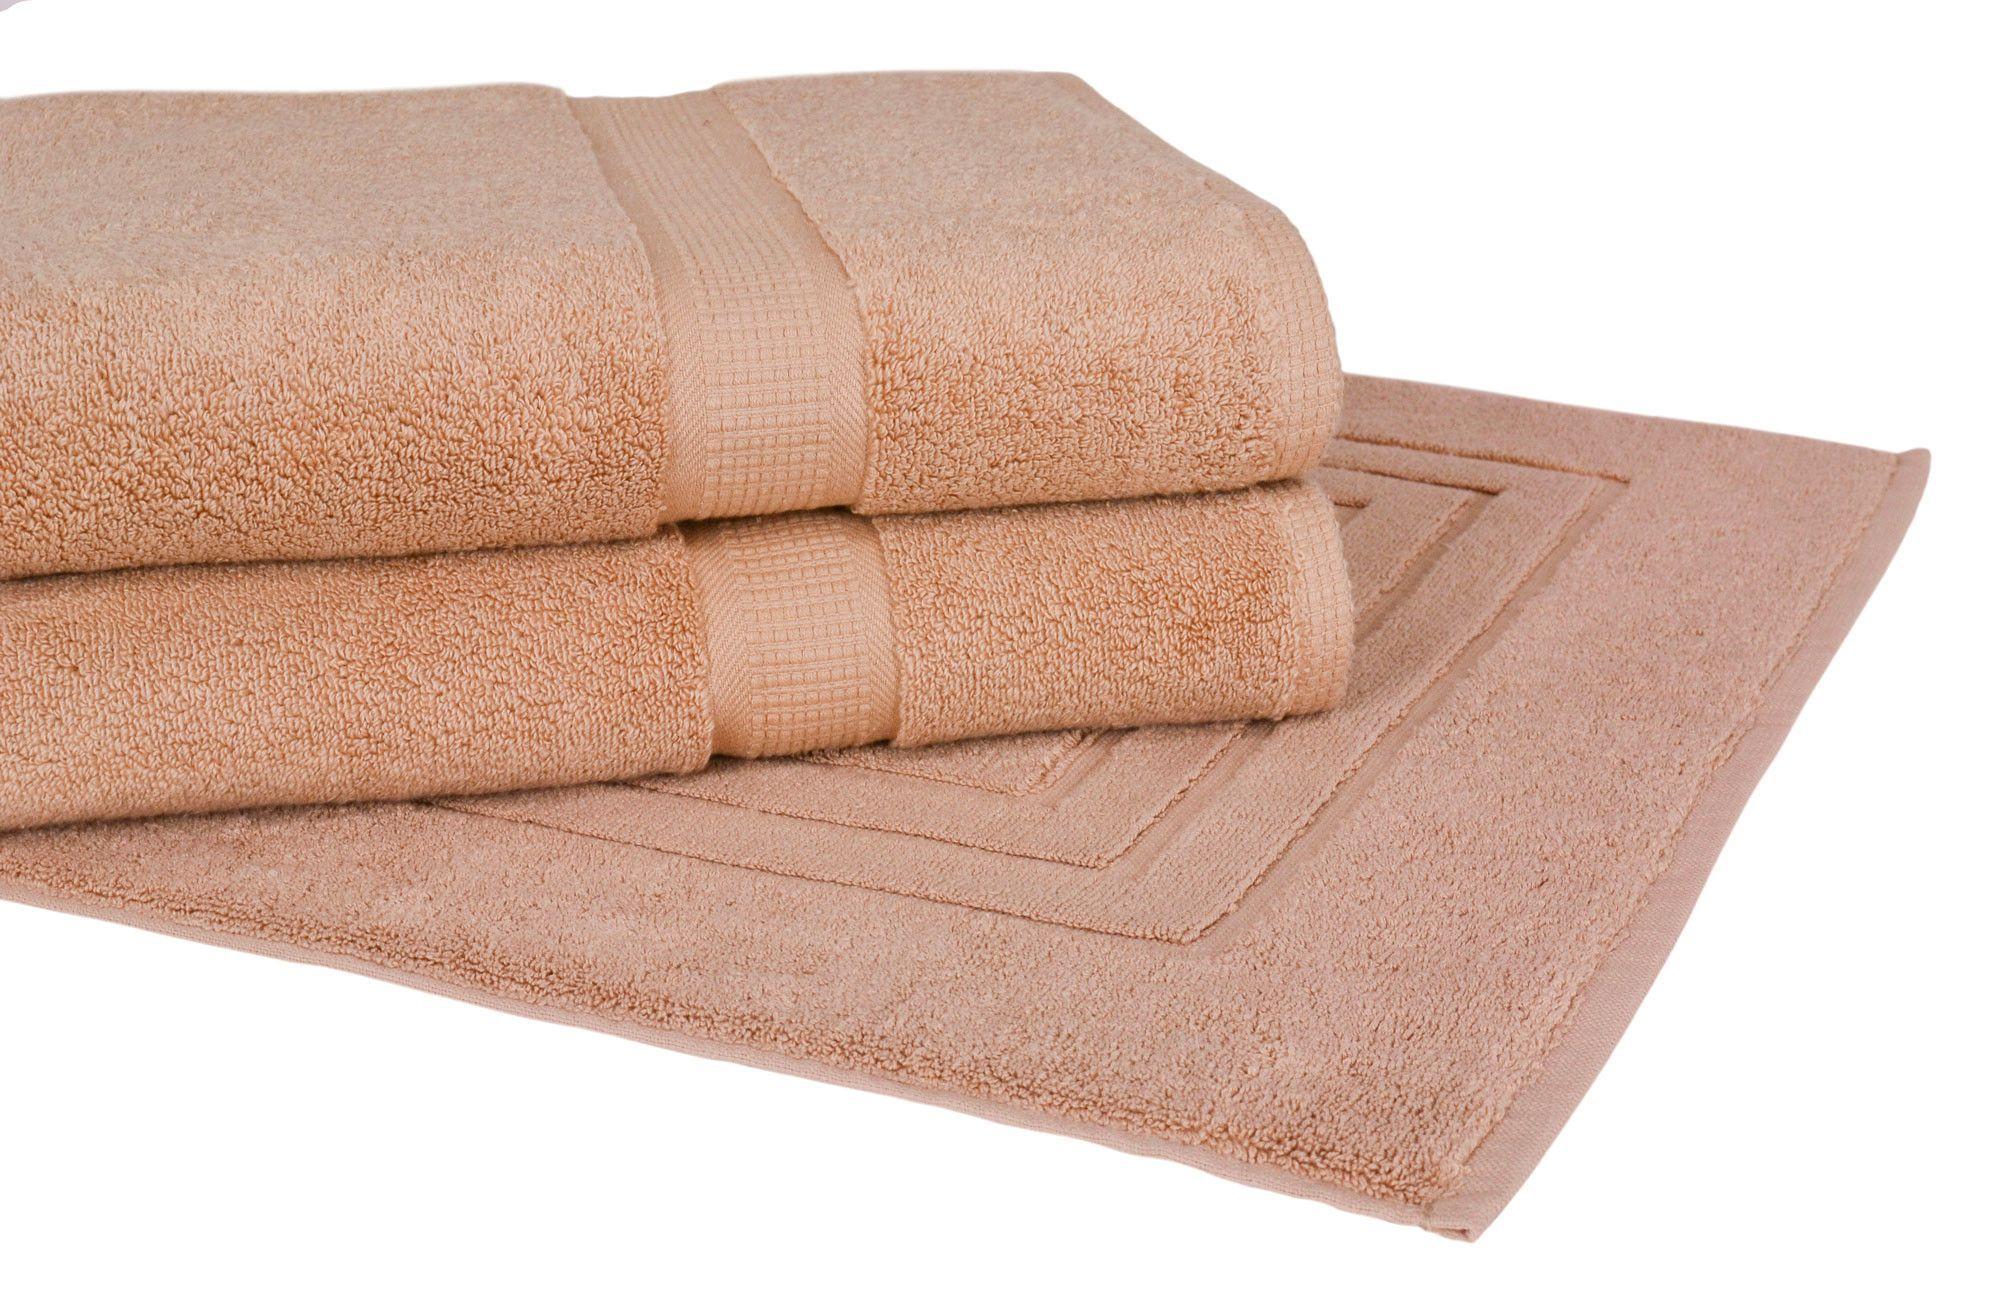 Growers 3 Piece Towel Set